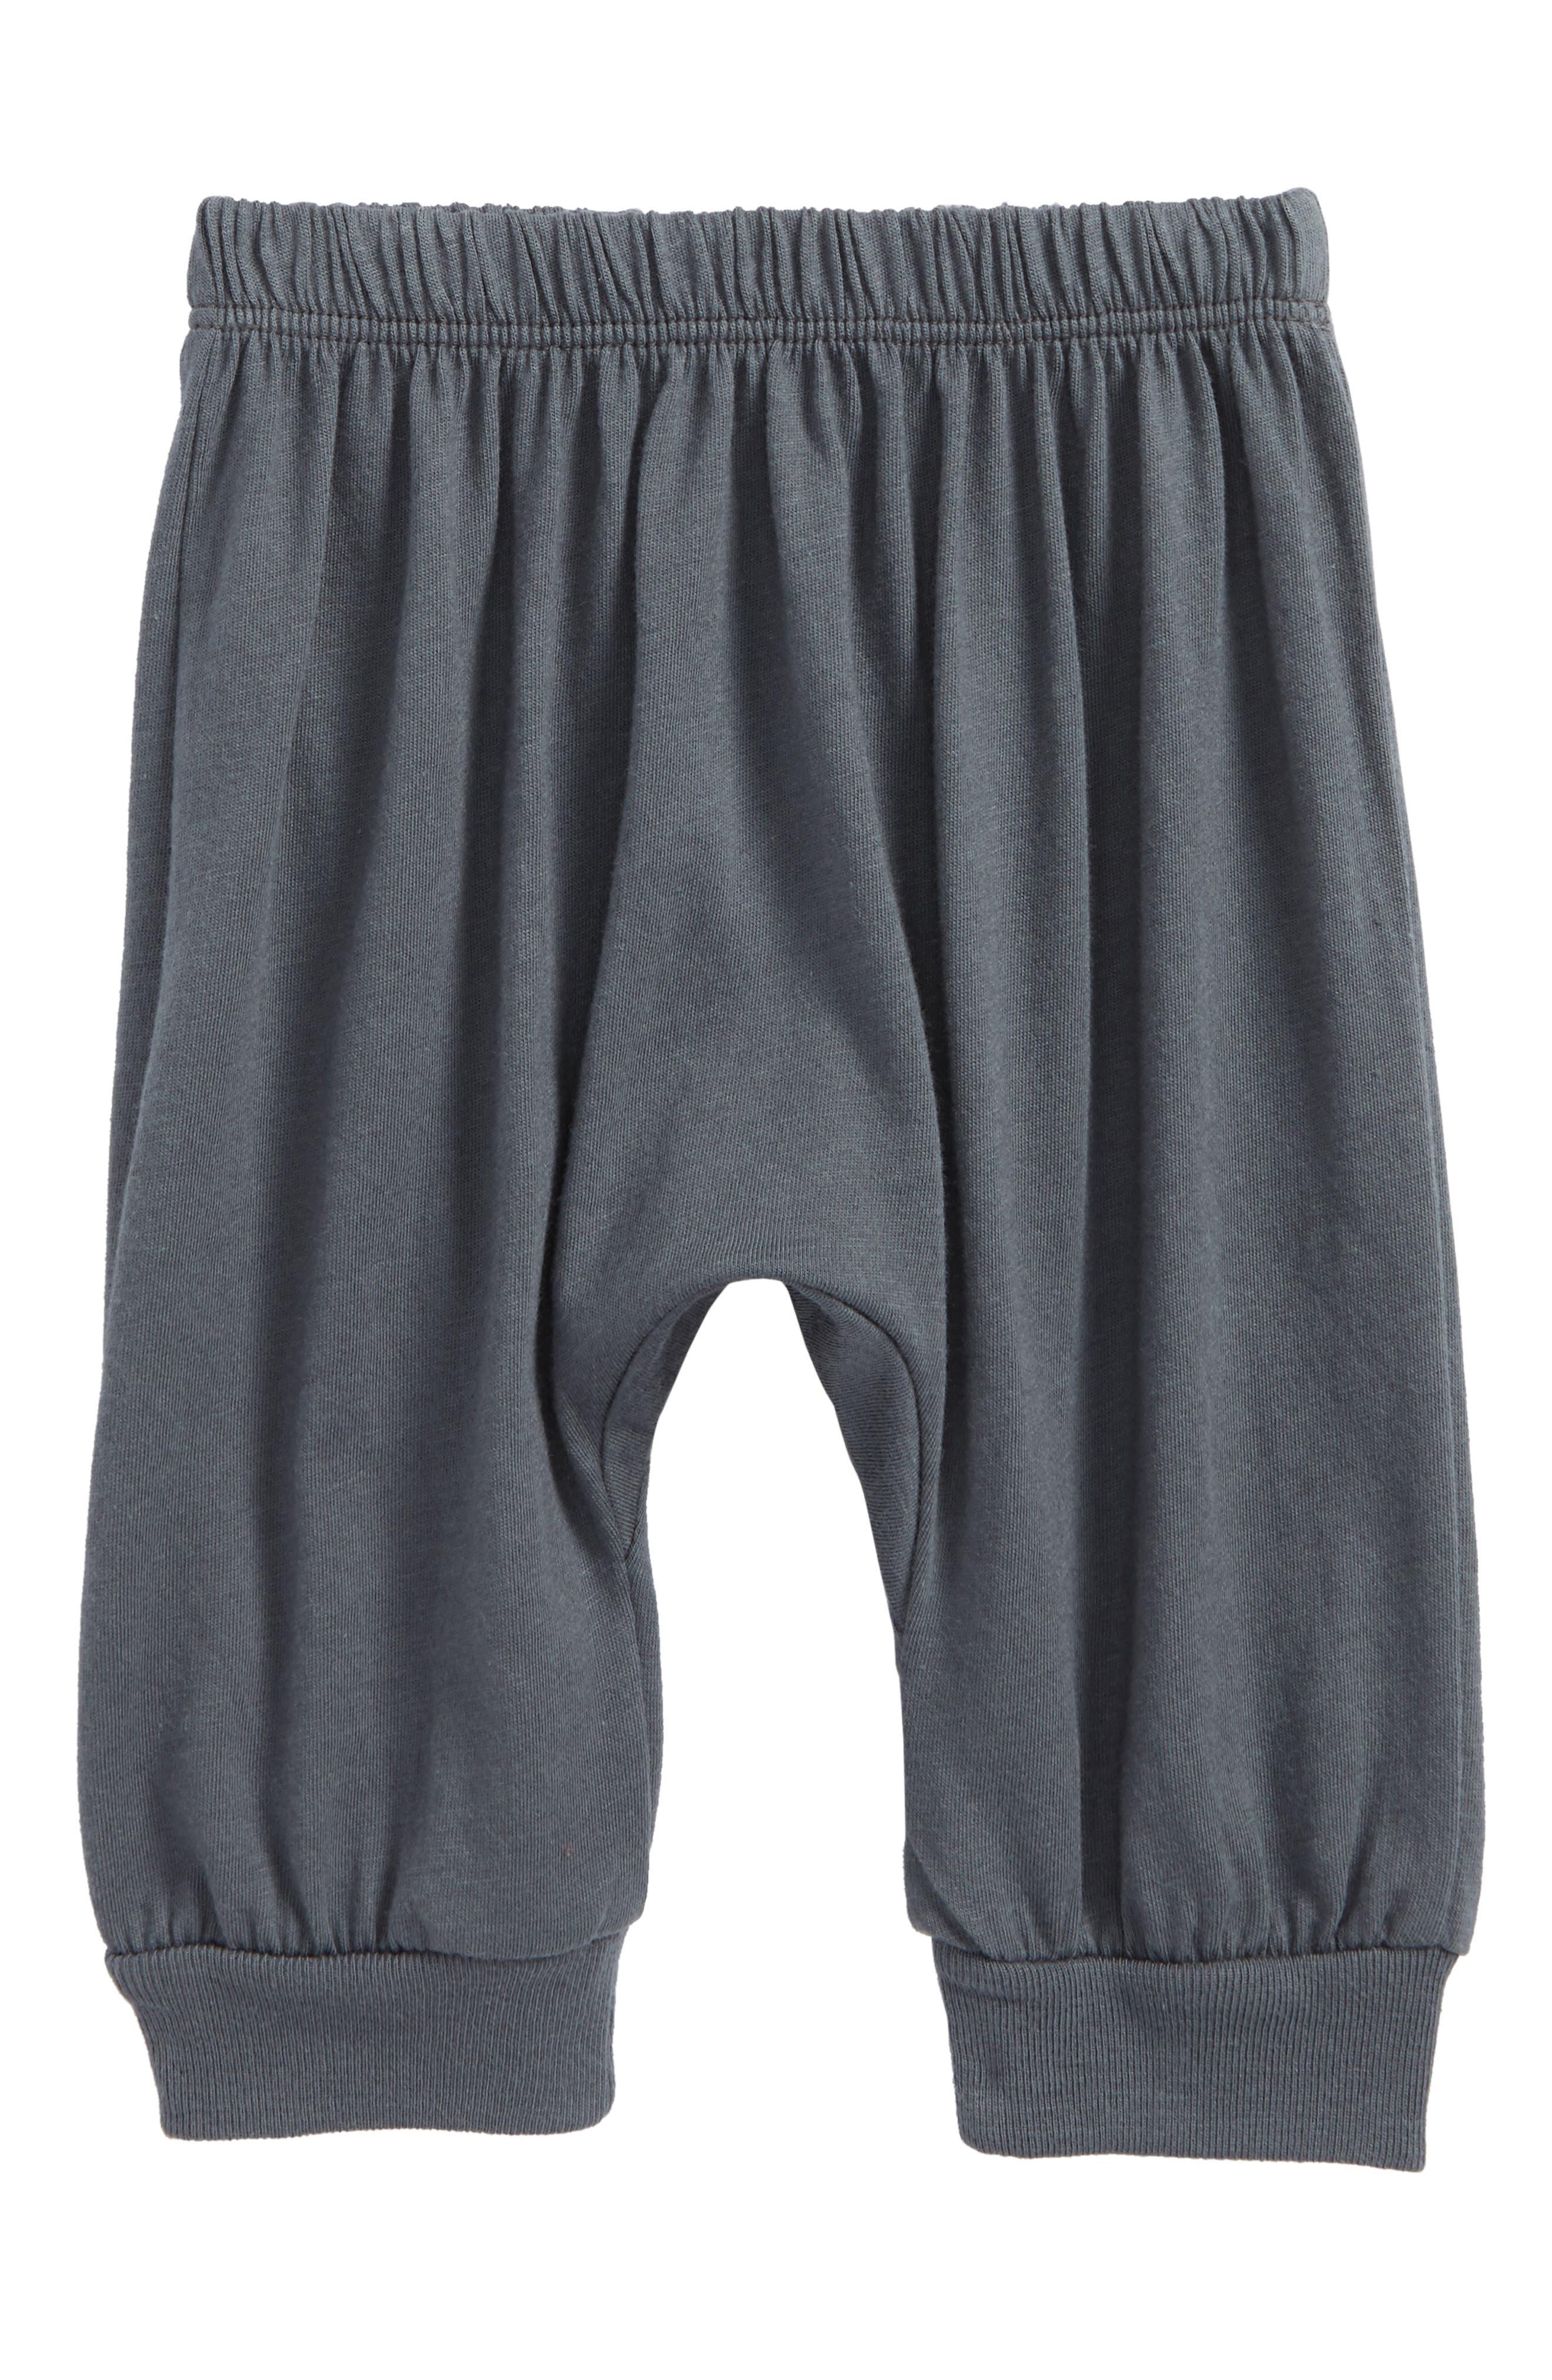 Peek Little Peanut Happy Pants,                         Main,                         color, 023